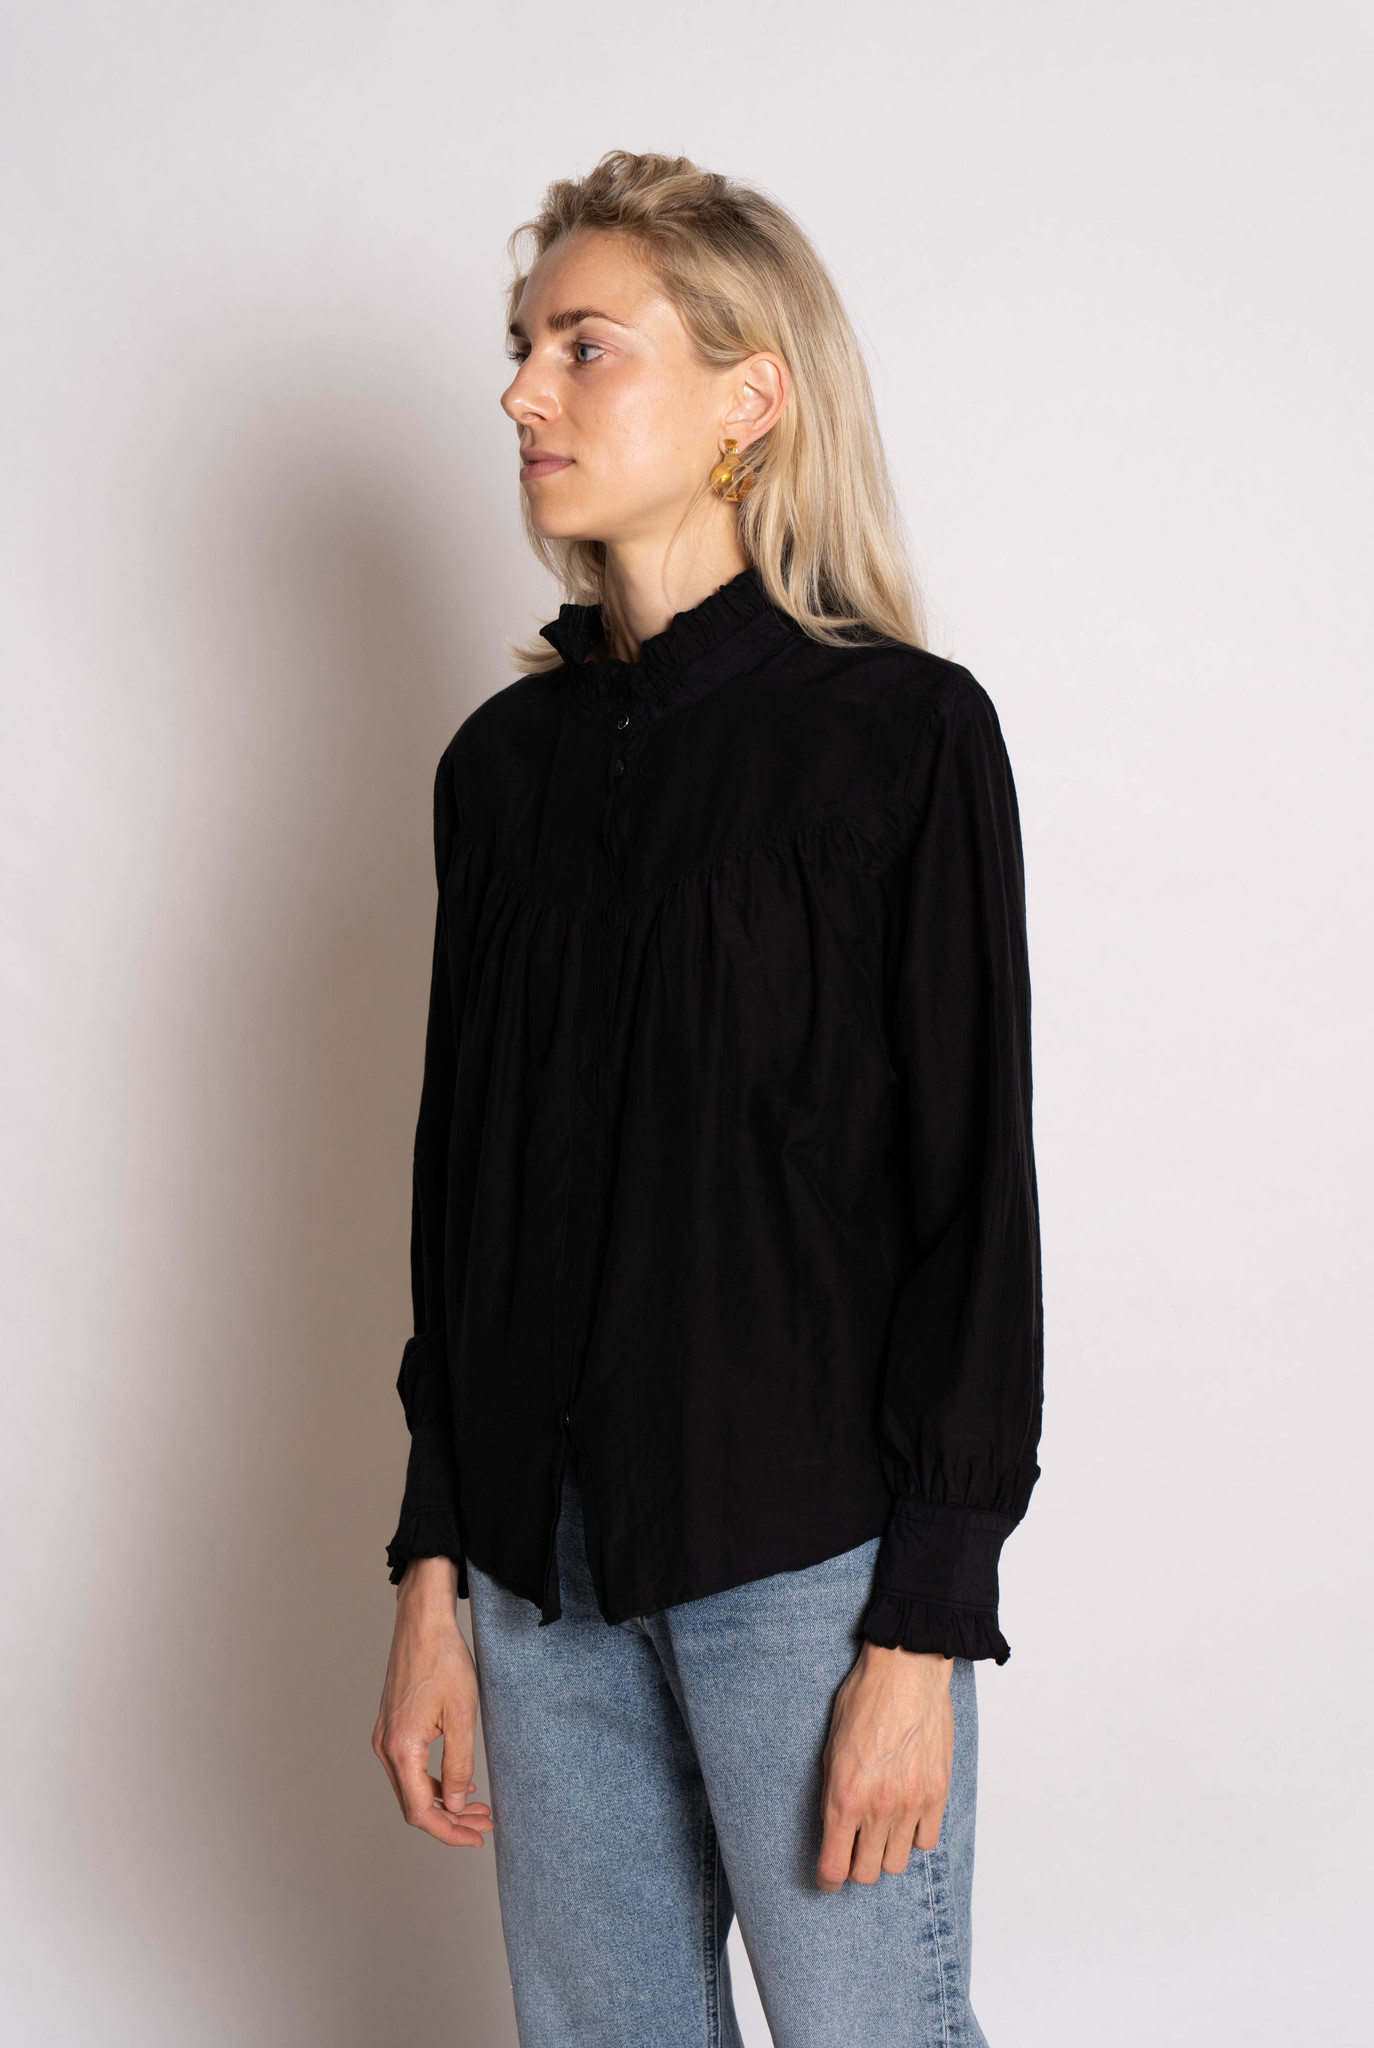 thin blouse ruffled collar black